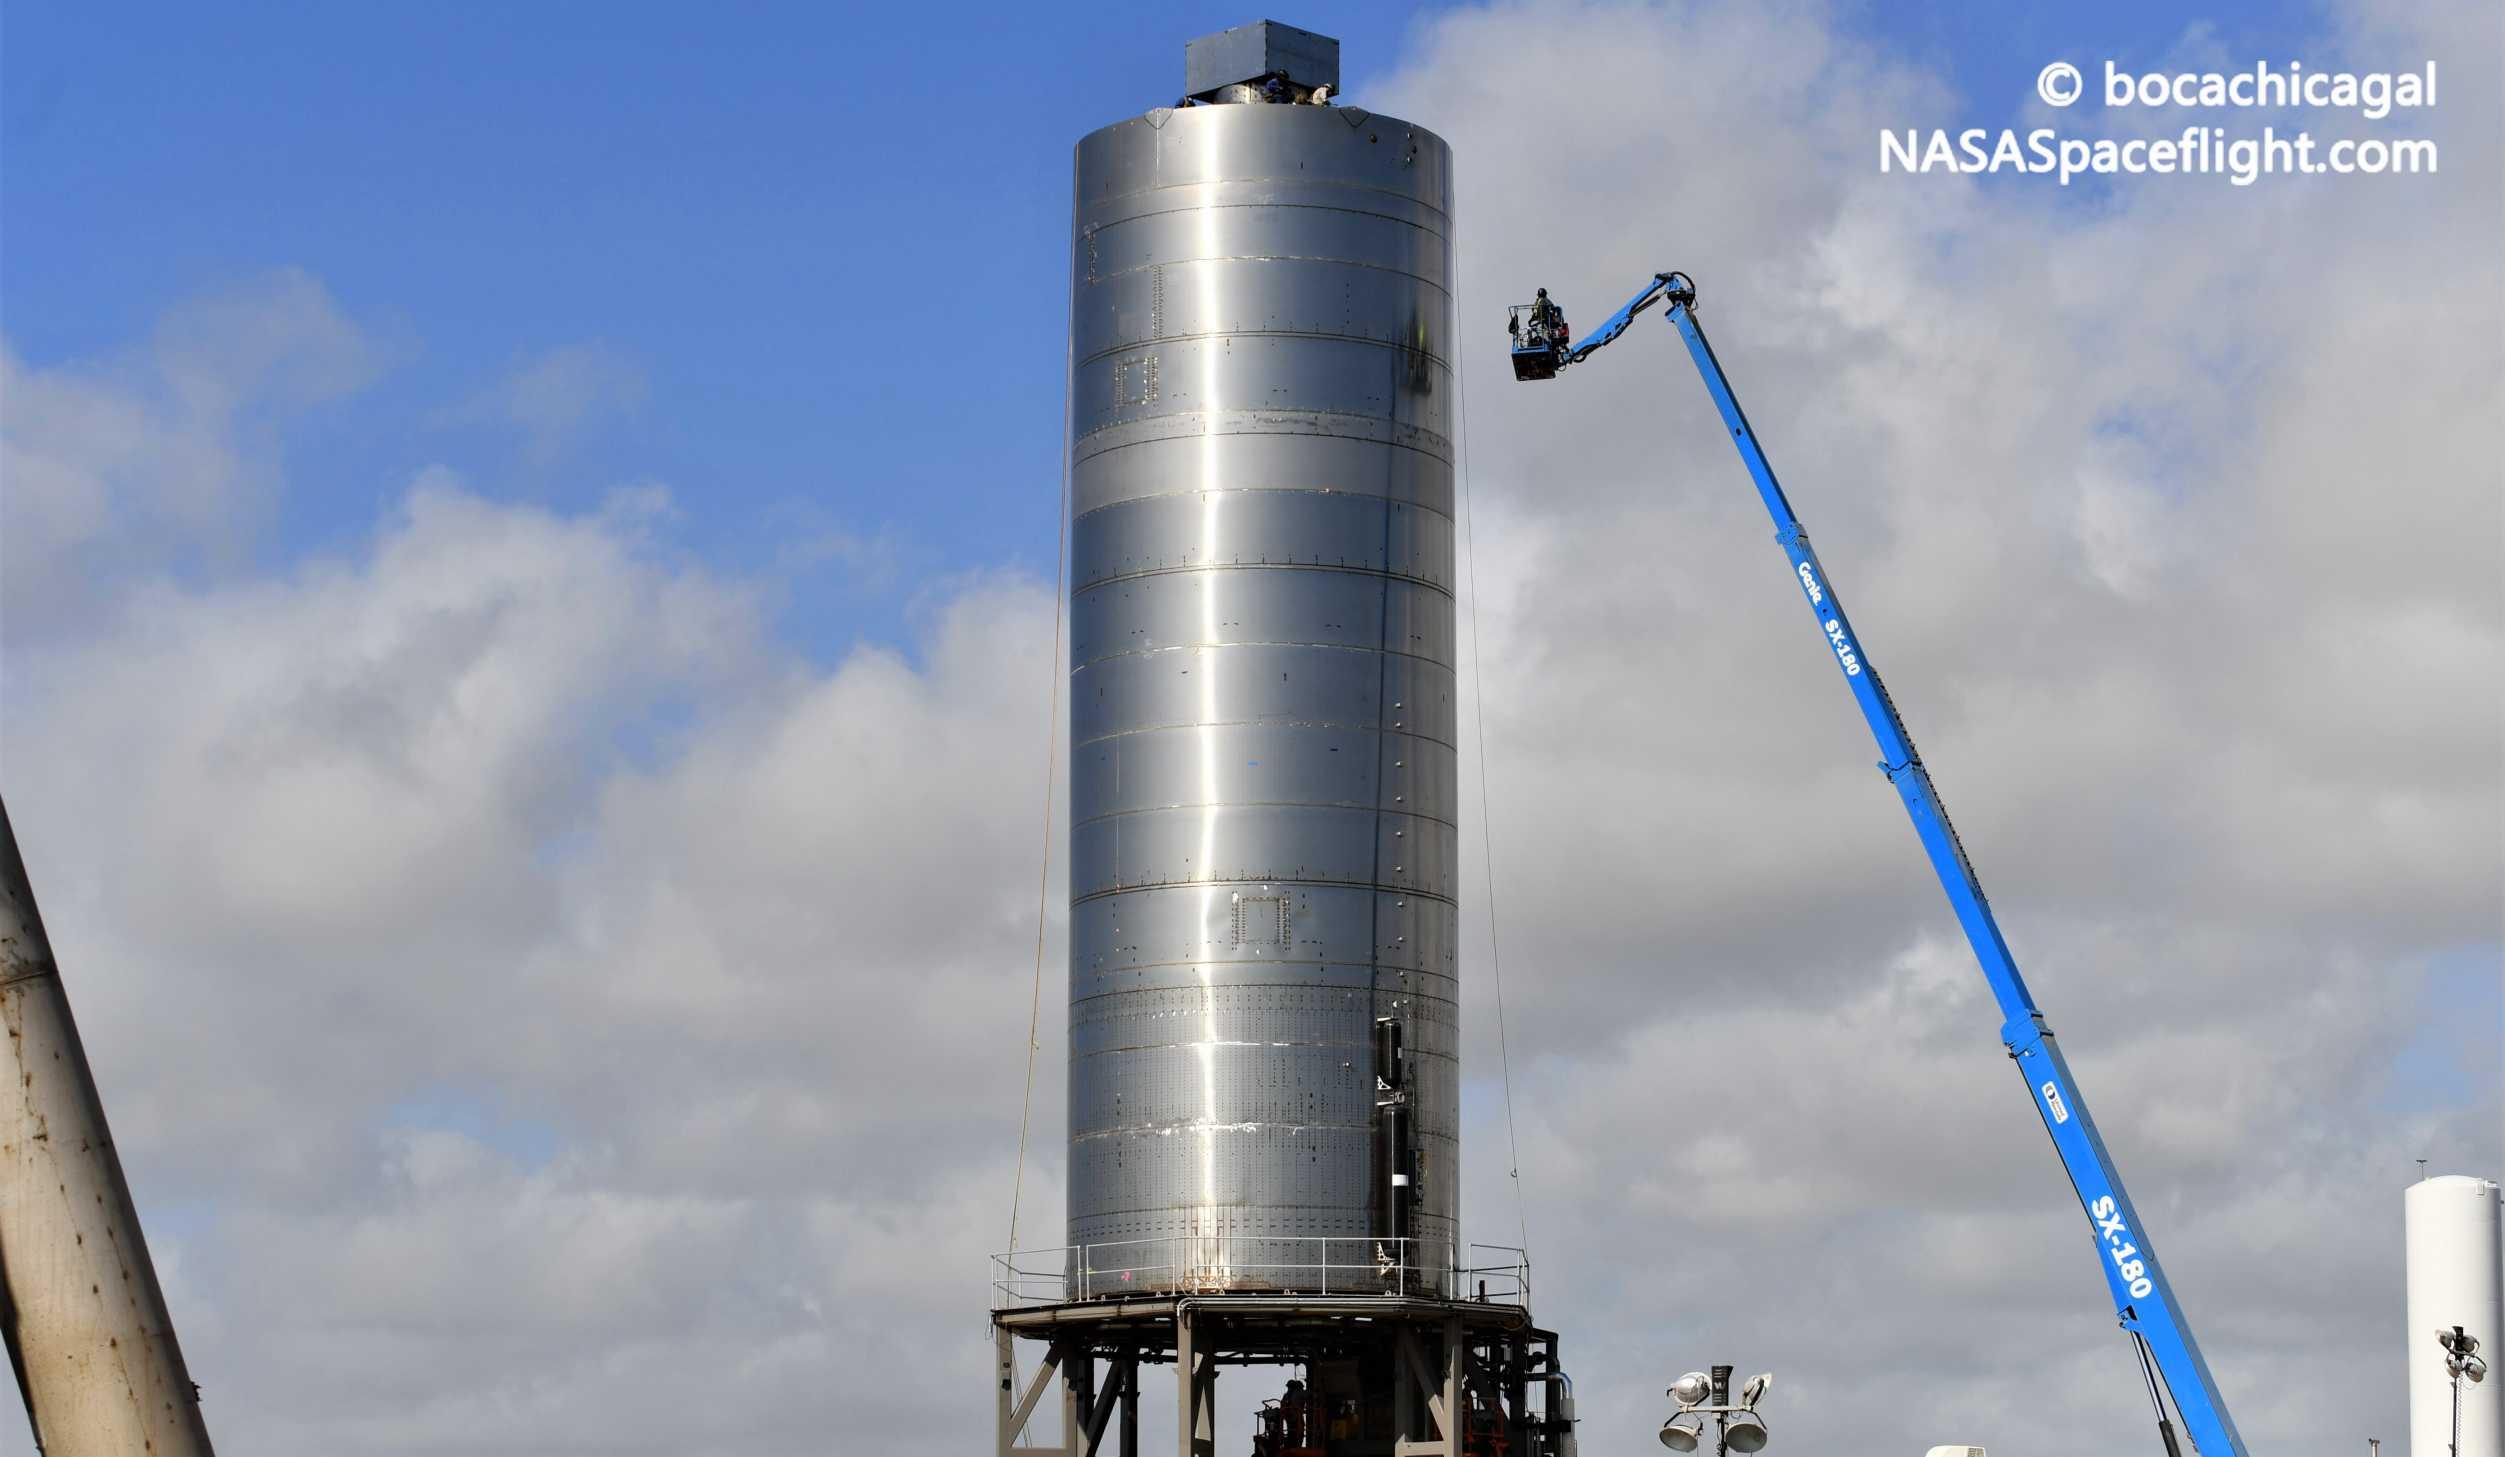 Starship Boca Chica 071420 (NASASpaceflight – bocachicagal) SN5 pad work 7 crop (c)